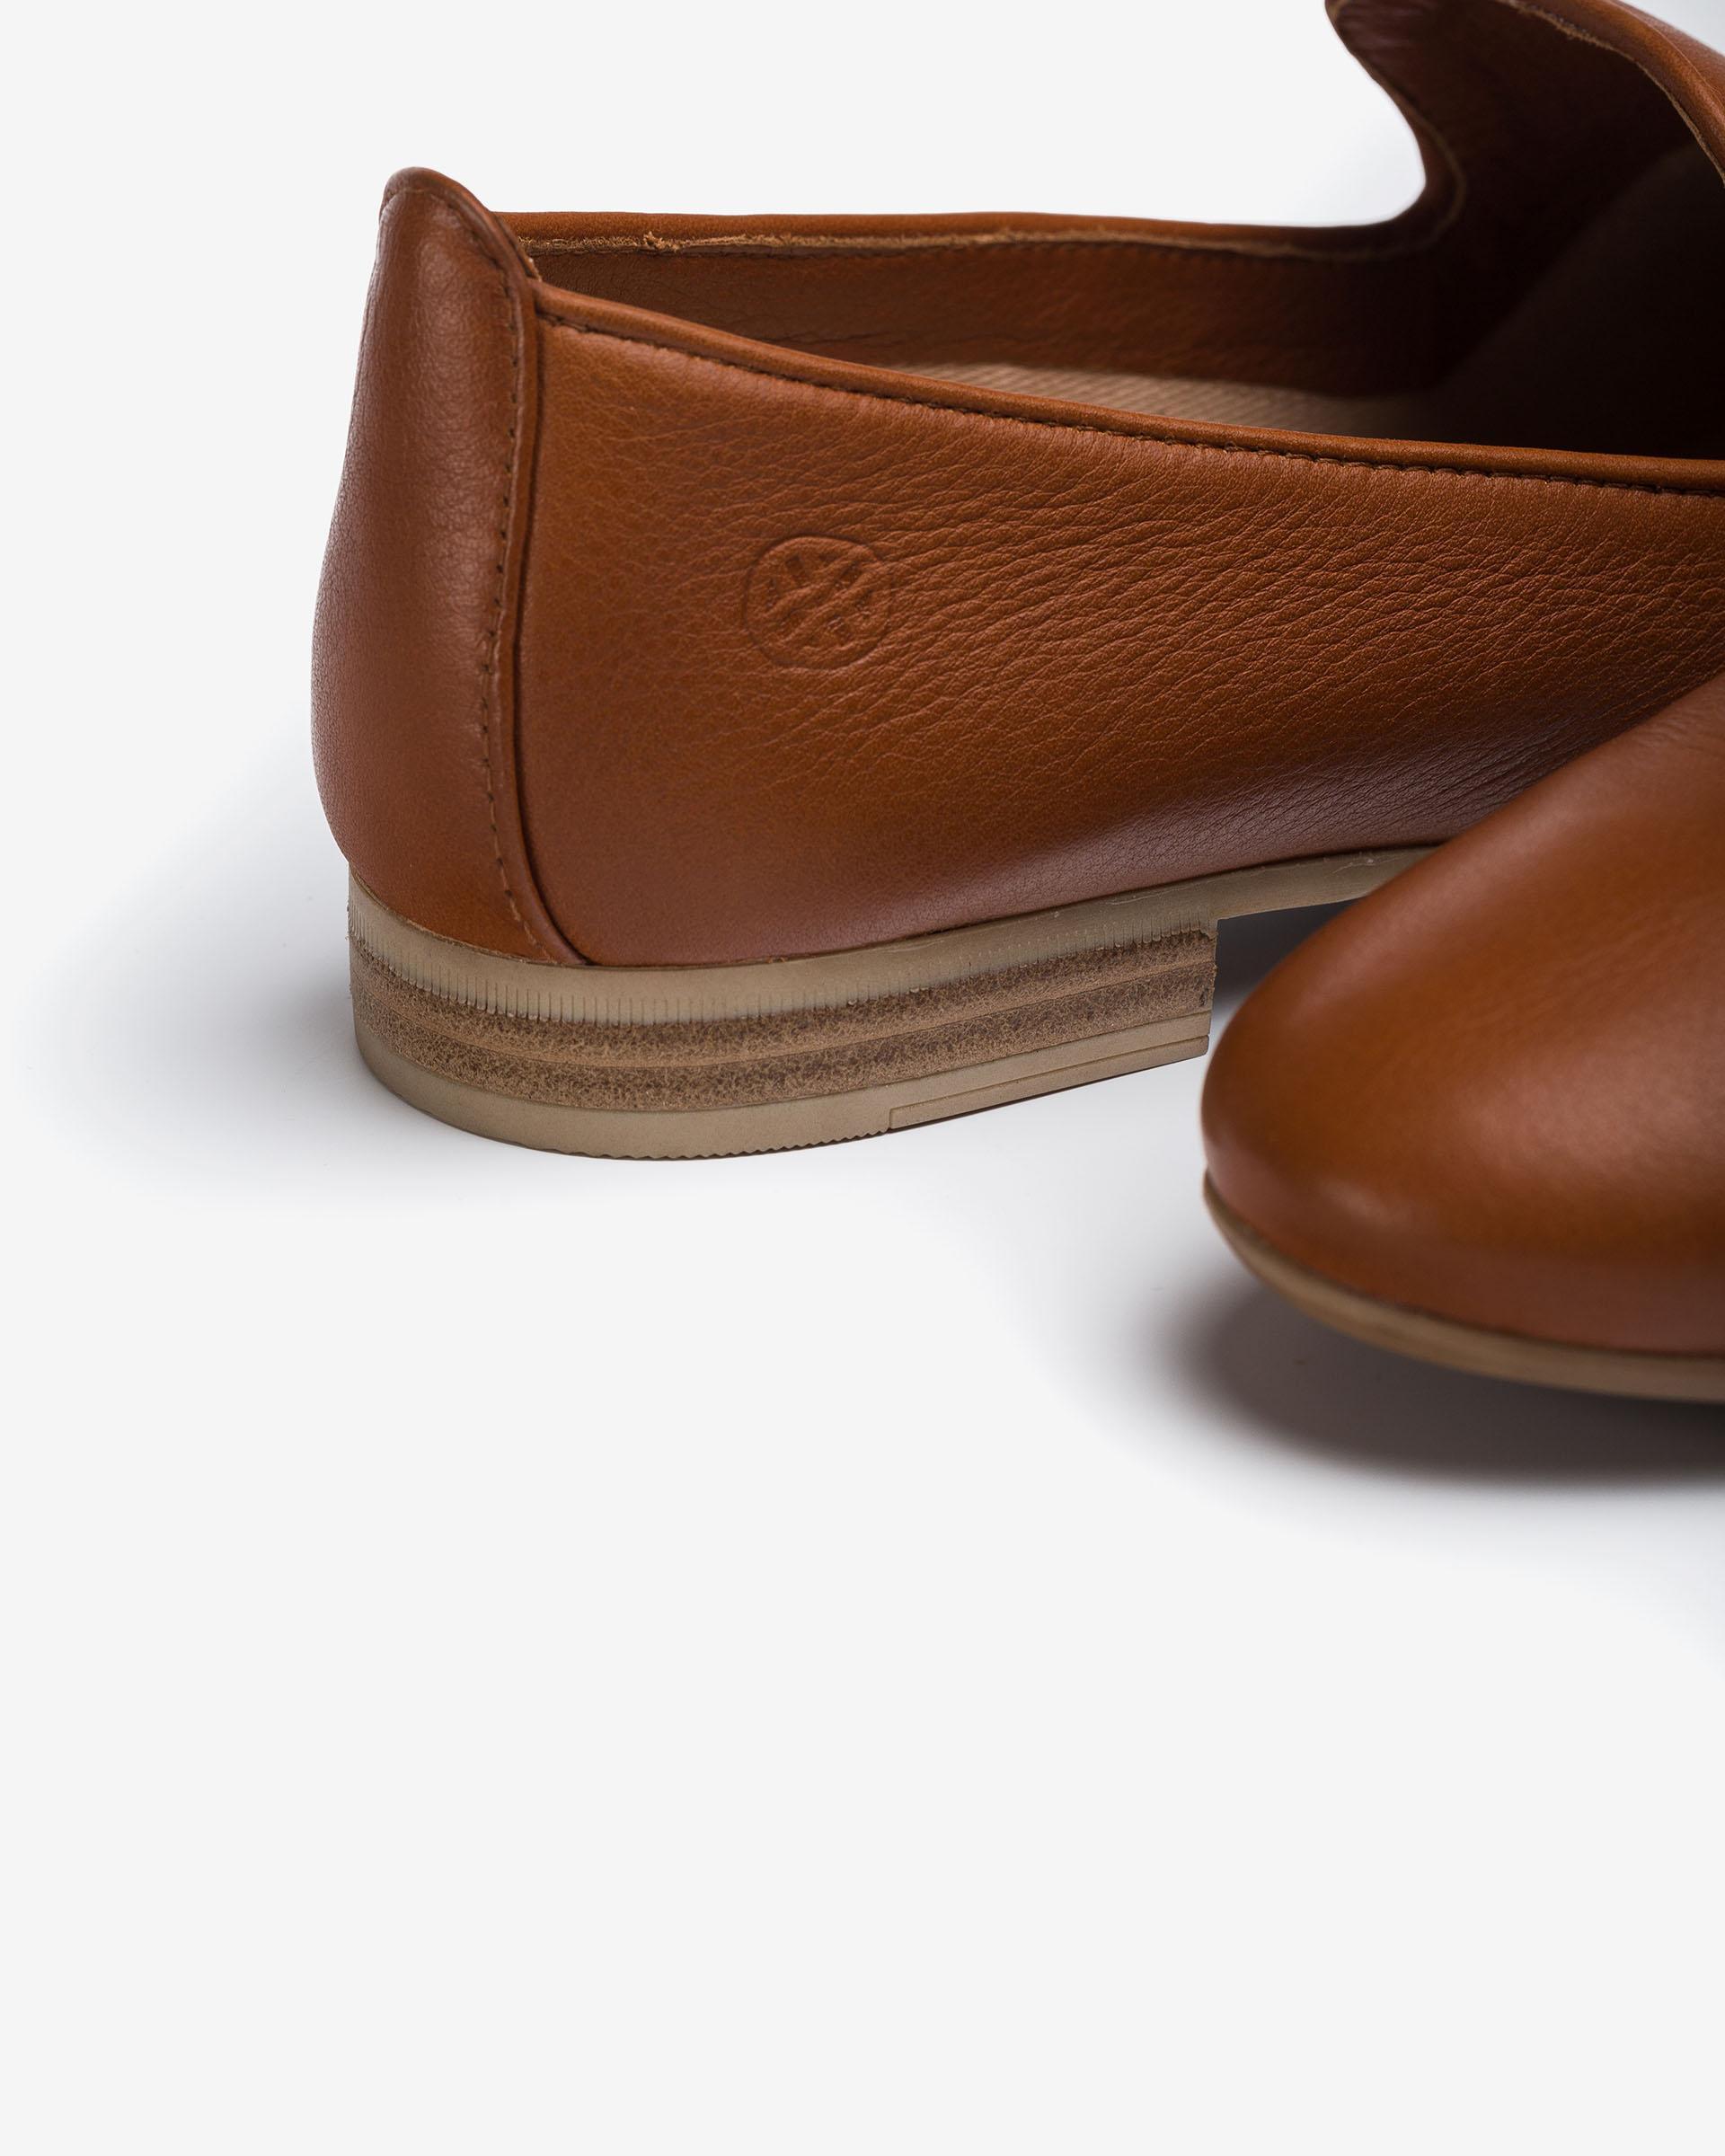 UNISA Slippers en cuir avec monogramme décoratif  DAYA_CRE 3